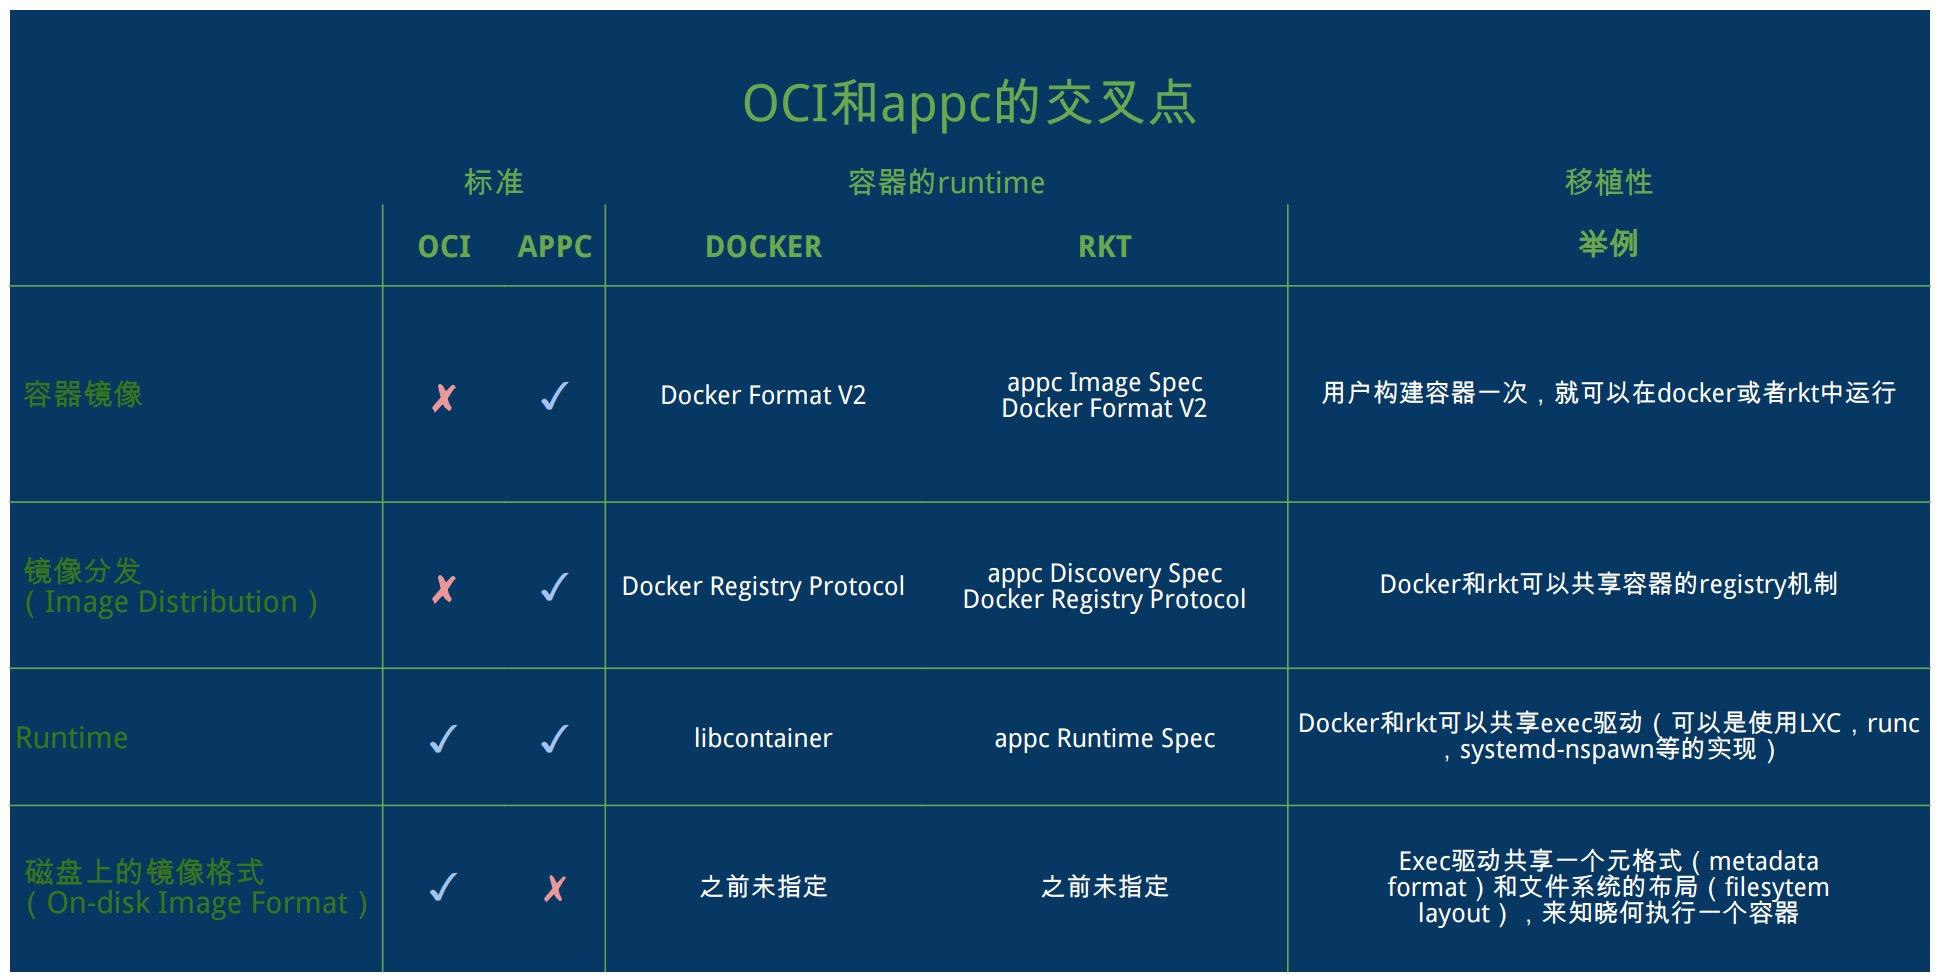 OCI 理清容器标准和基金会 OCI CNCF appc 和 rkt